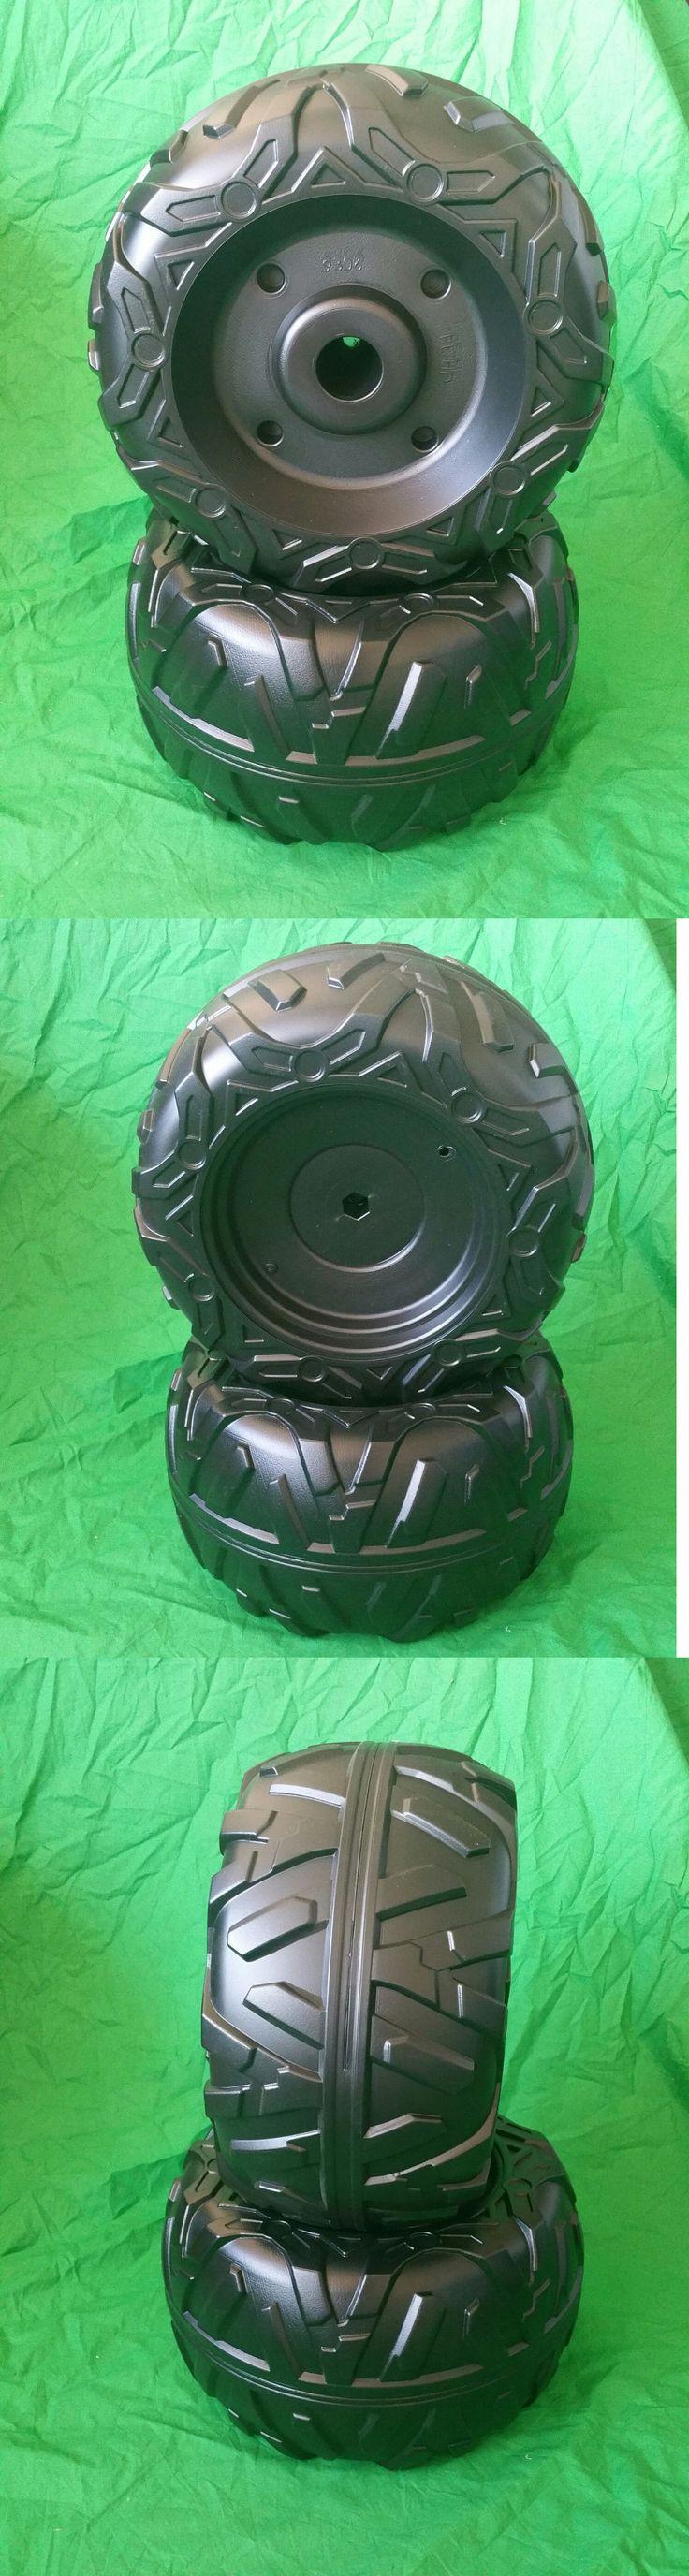 1970-Now 11746: Peg Perego Polaris Ranger Rzr 900 12V Rear Wheel (Set Of 2) Tires -> BUY IT NOW ONLY: $34 on eBay!